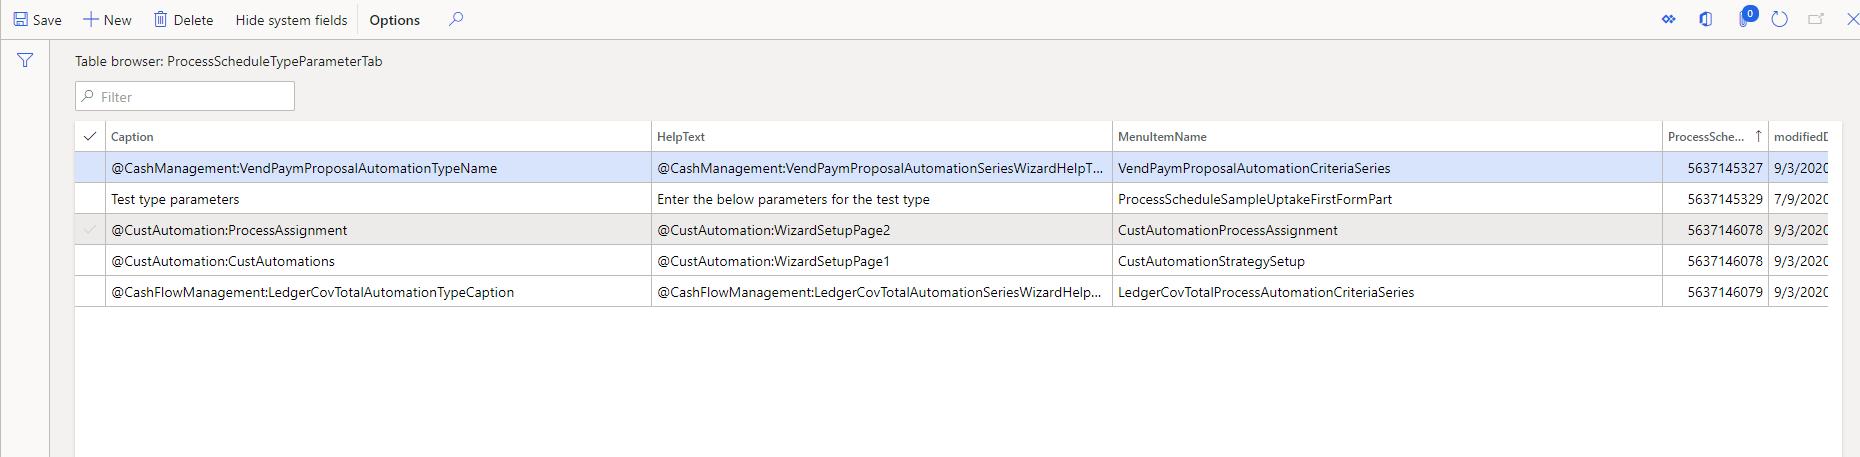 TableName: ProcessScheduleTypeParameterTab